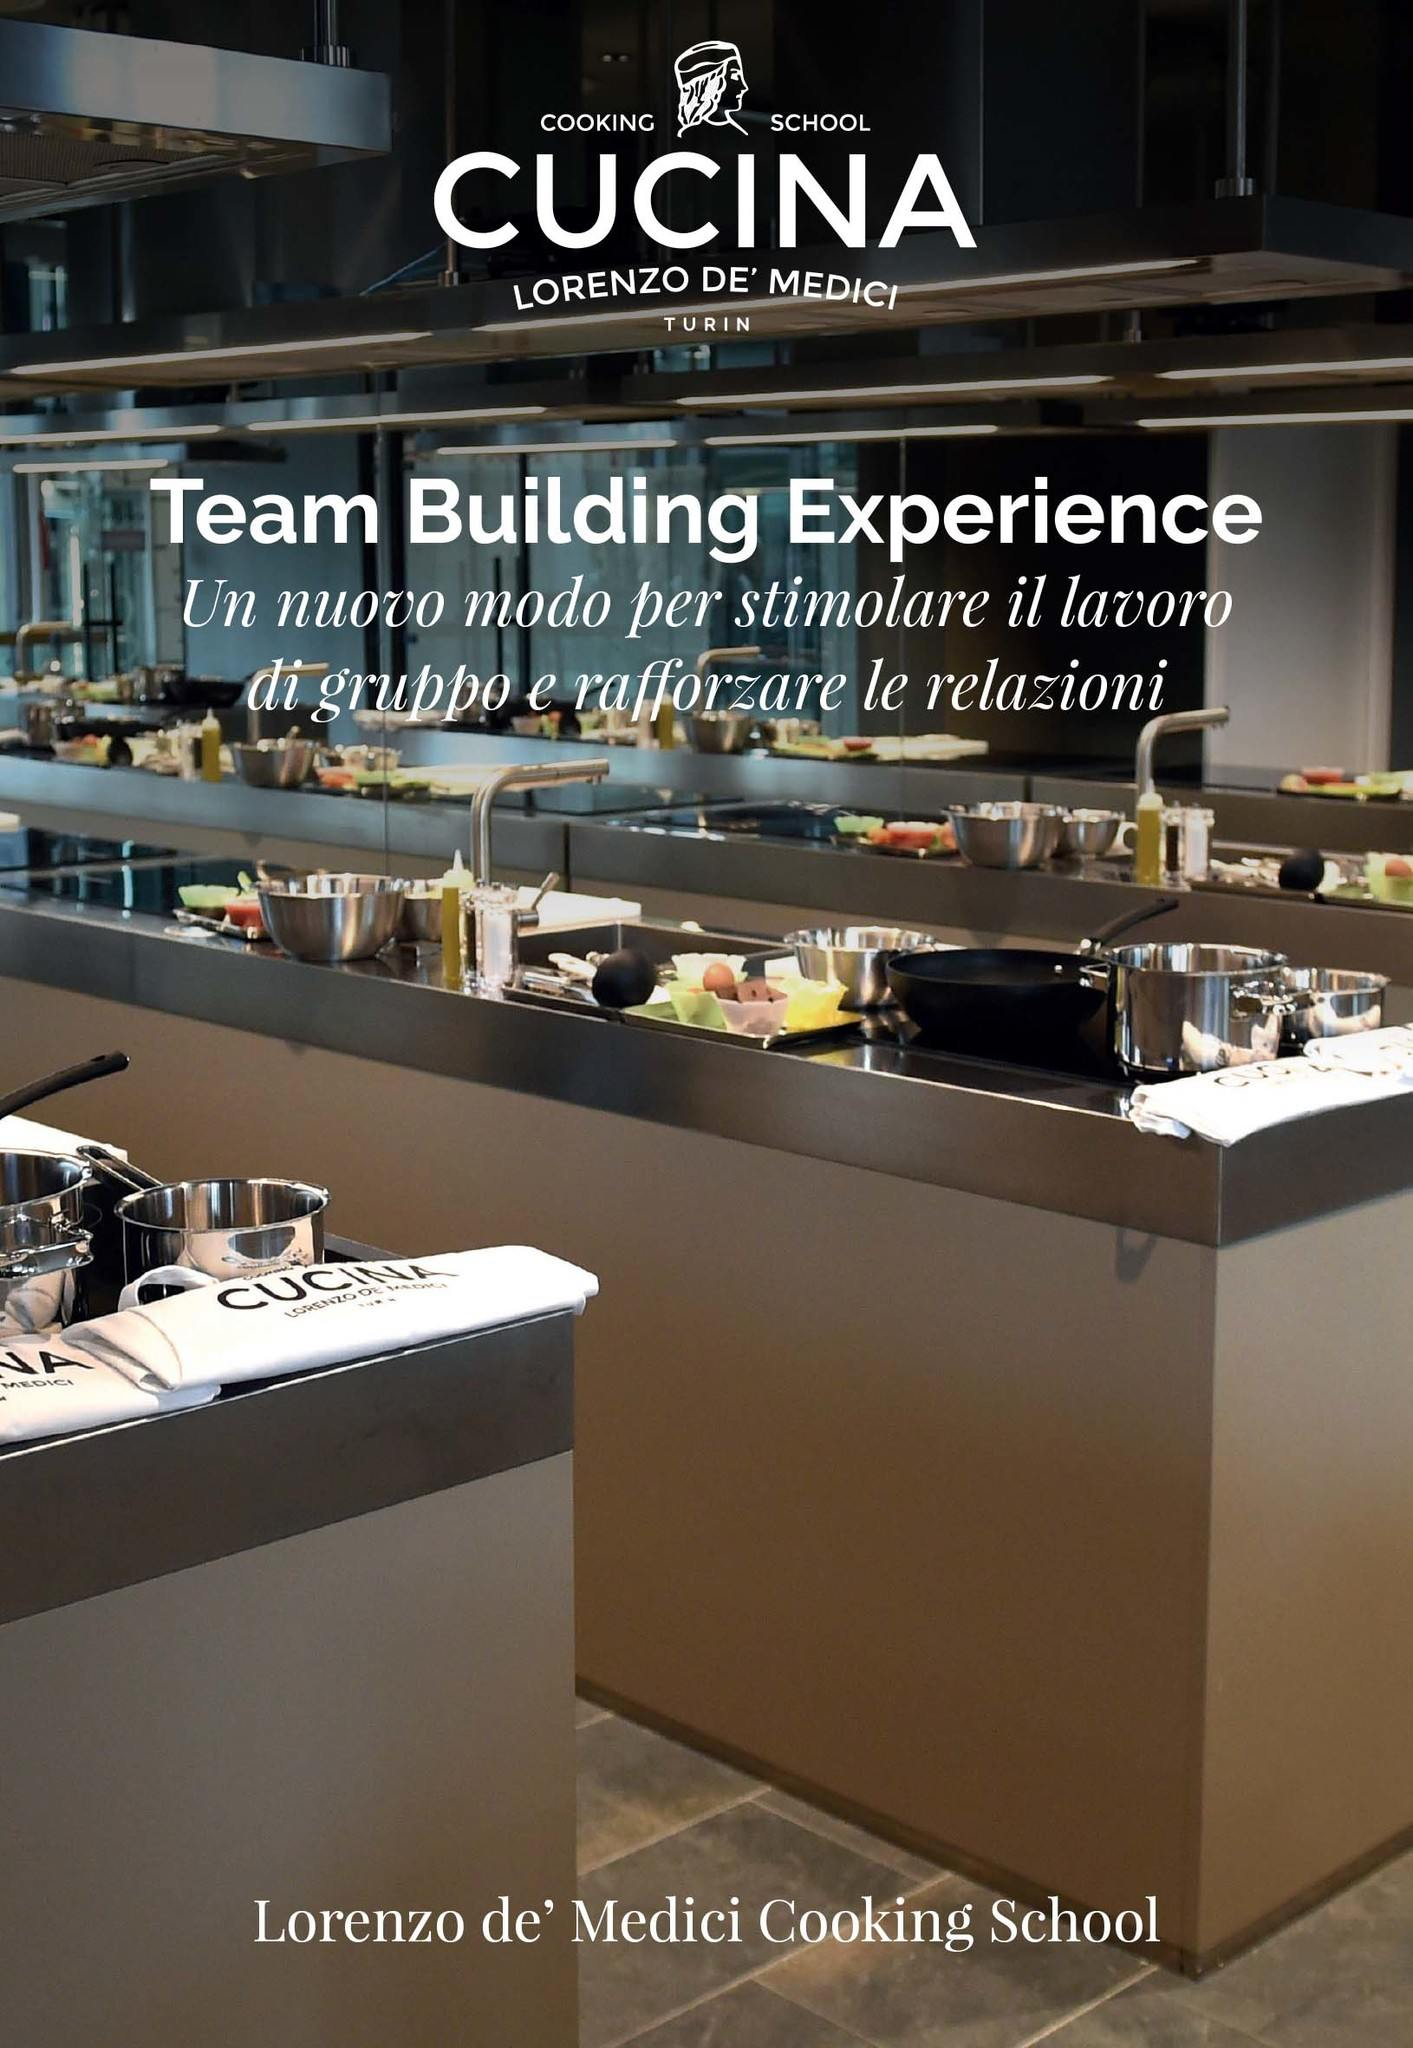 Cucina_Torino_Teambuilding_A5_2019_proof03 (4)-1